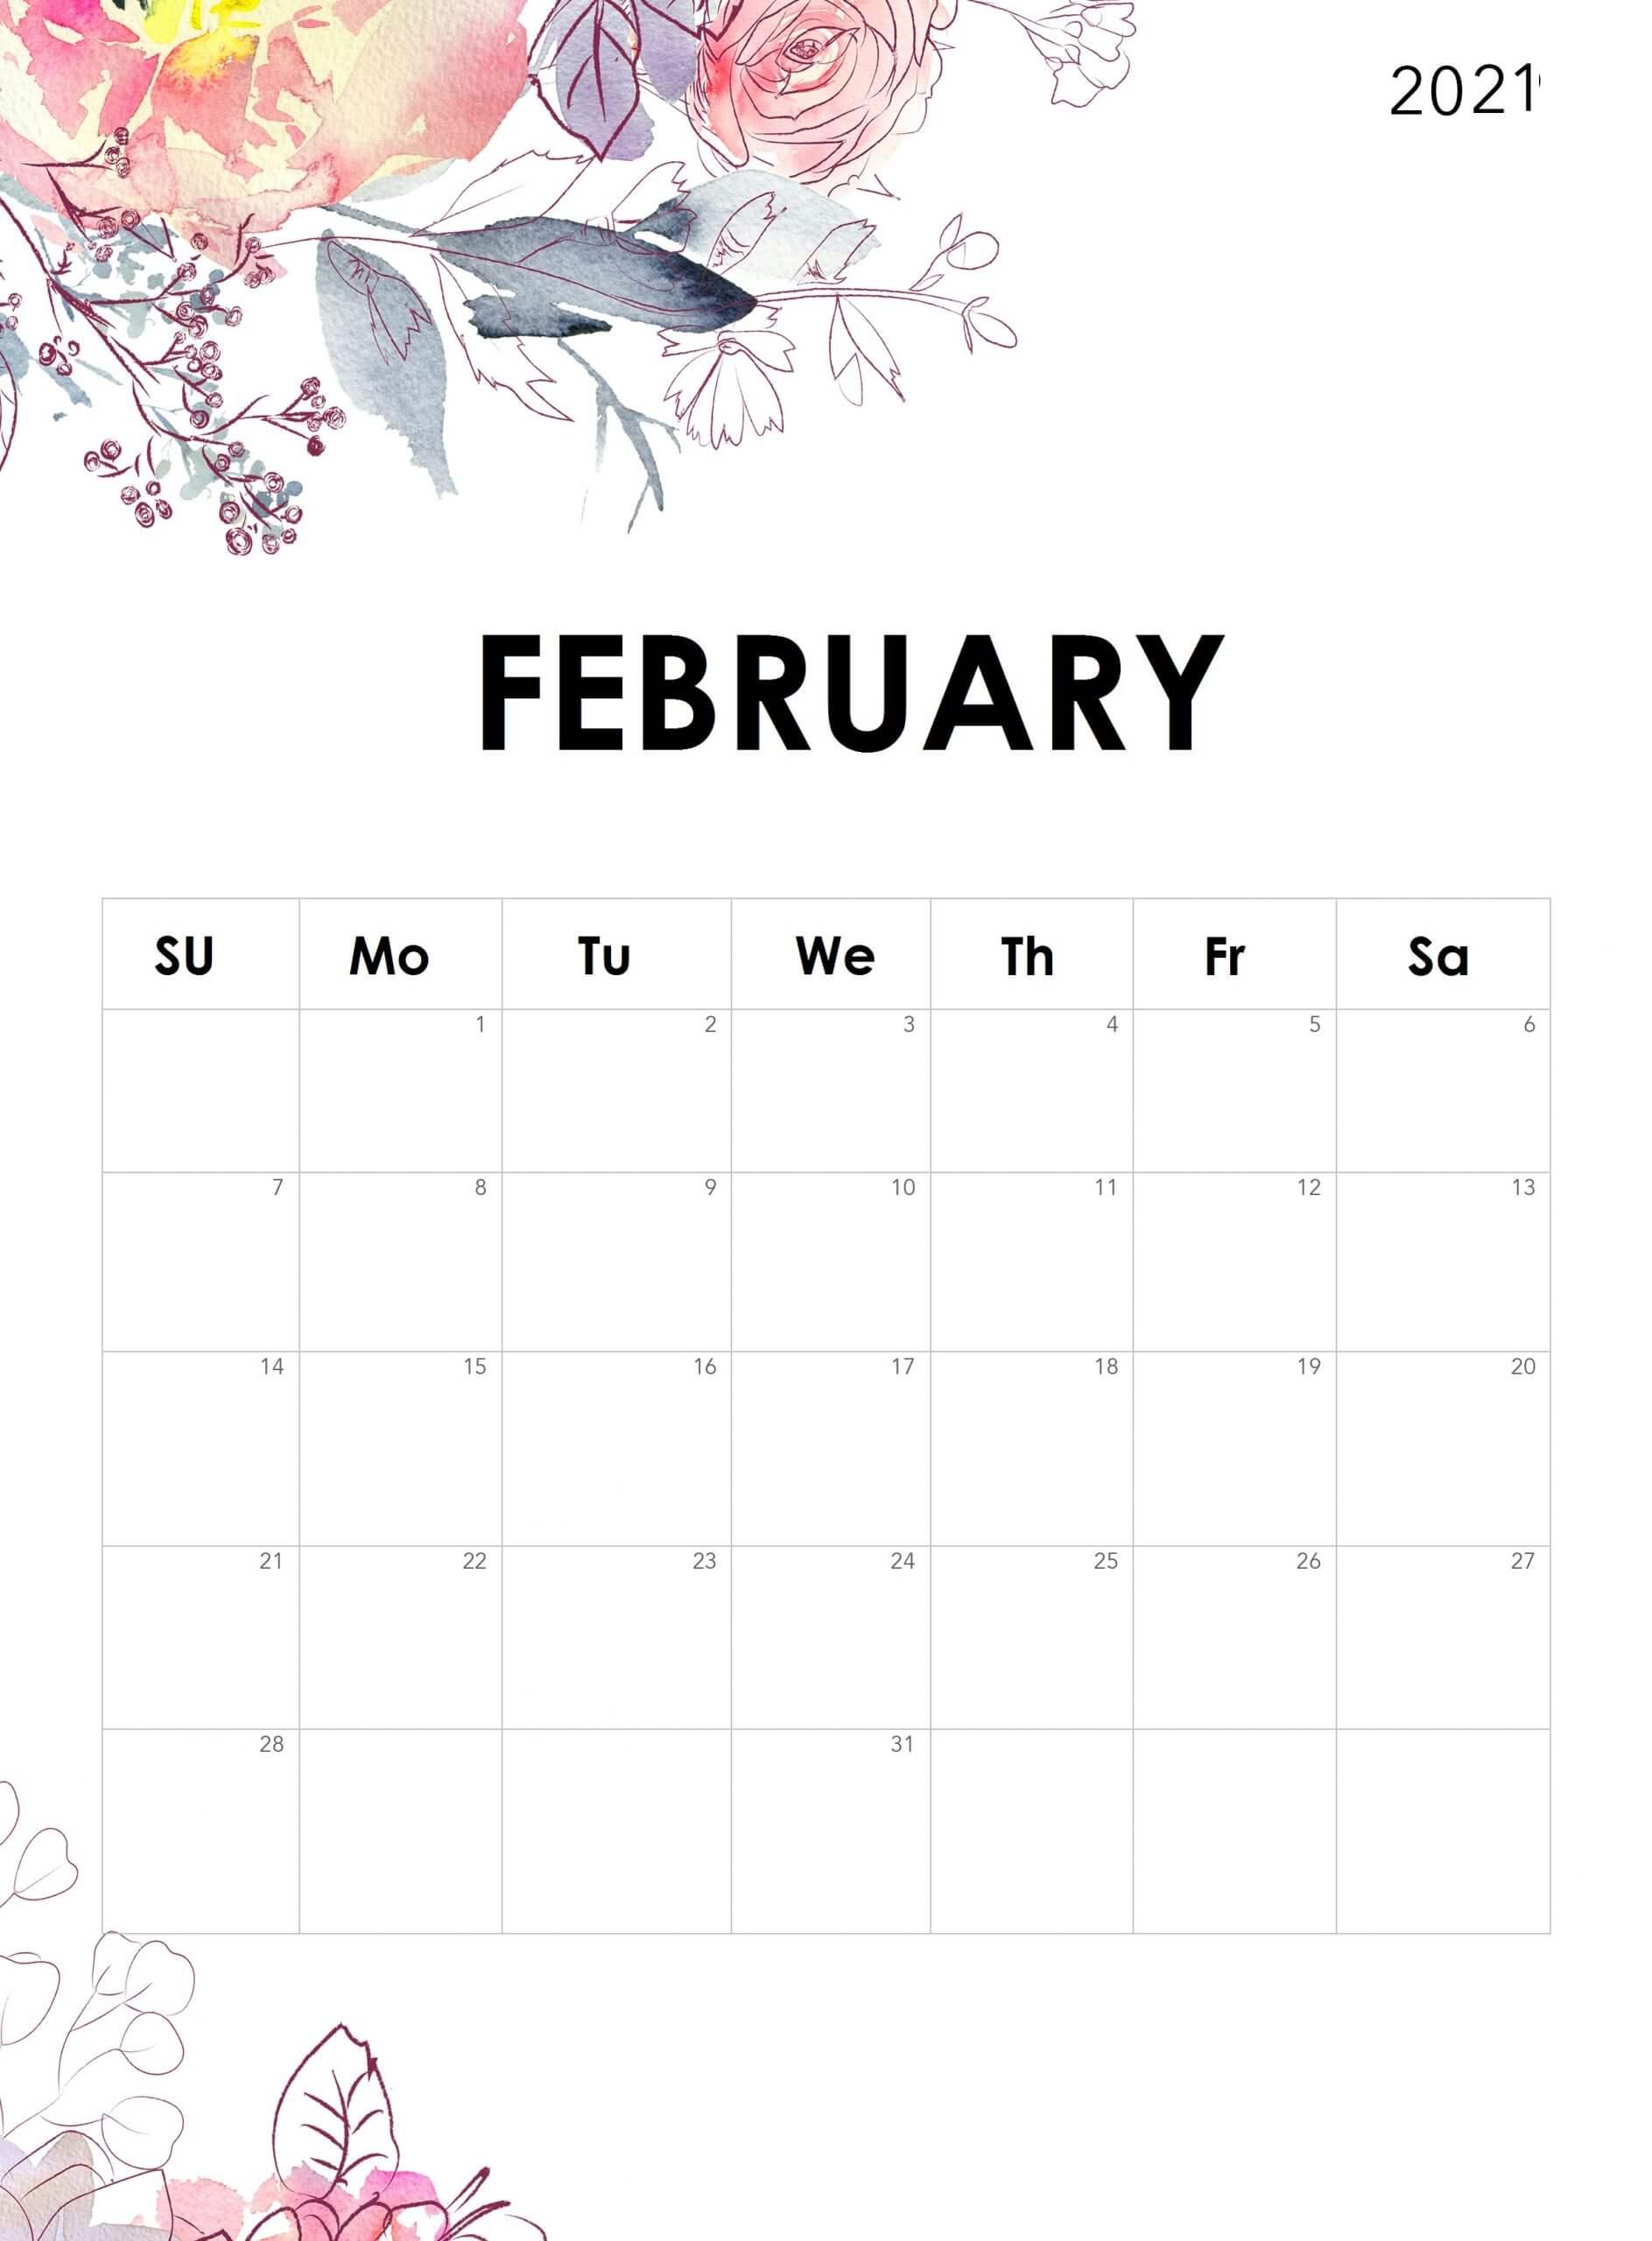 Floral February 2021 Desk Calendar